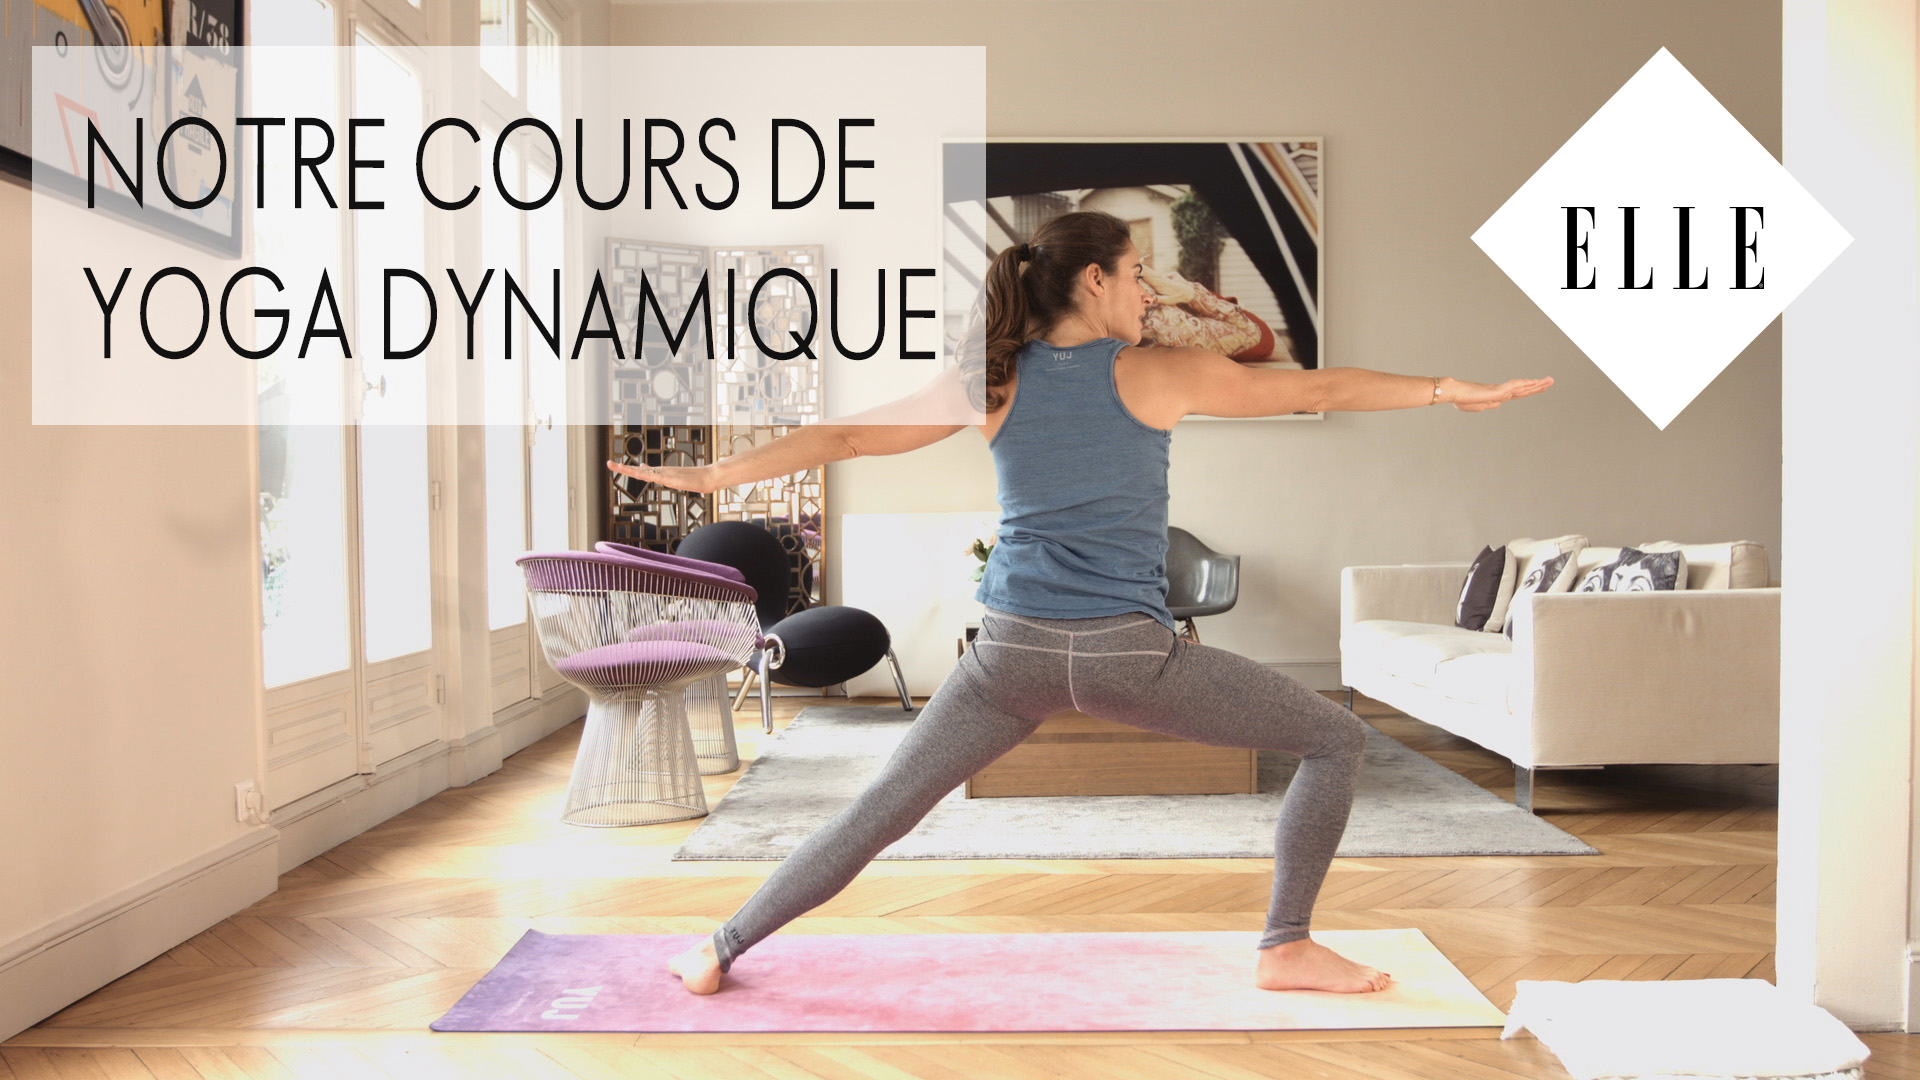 notre cours de yoga dynamique elle vid os. Black Bedroom Furniture Sets. Home Design Ideas